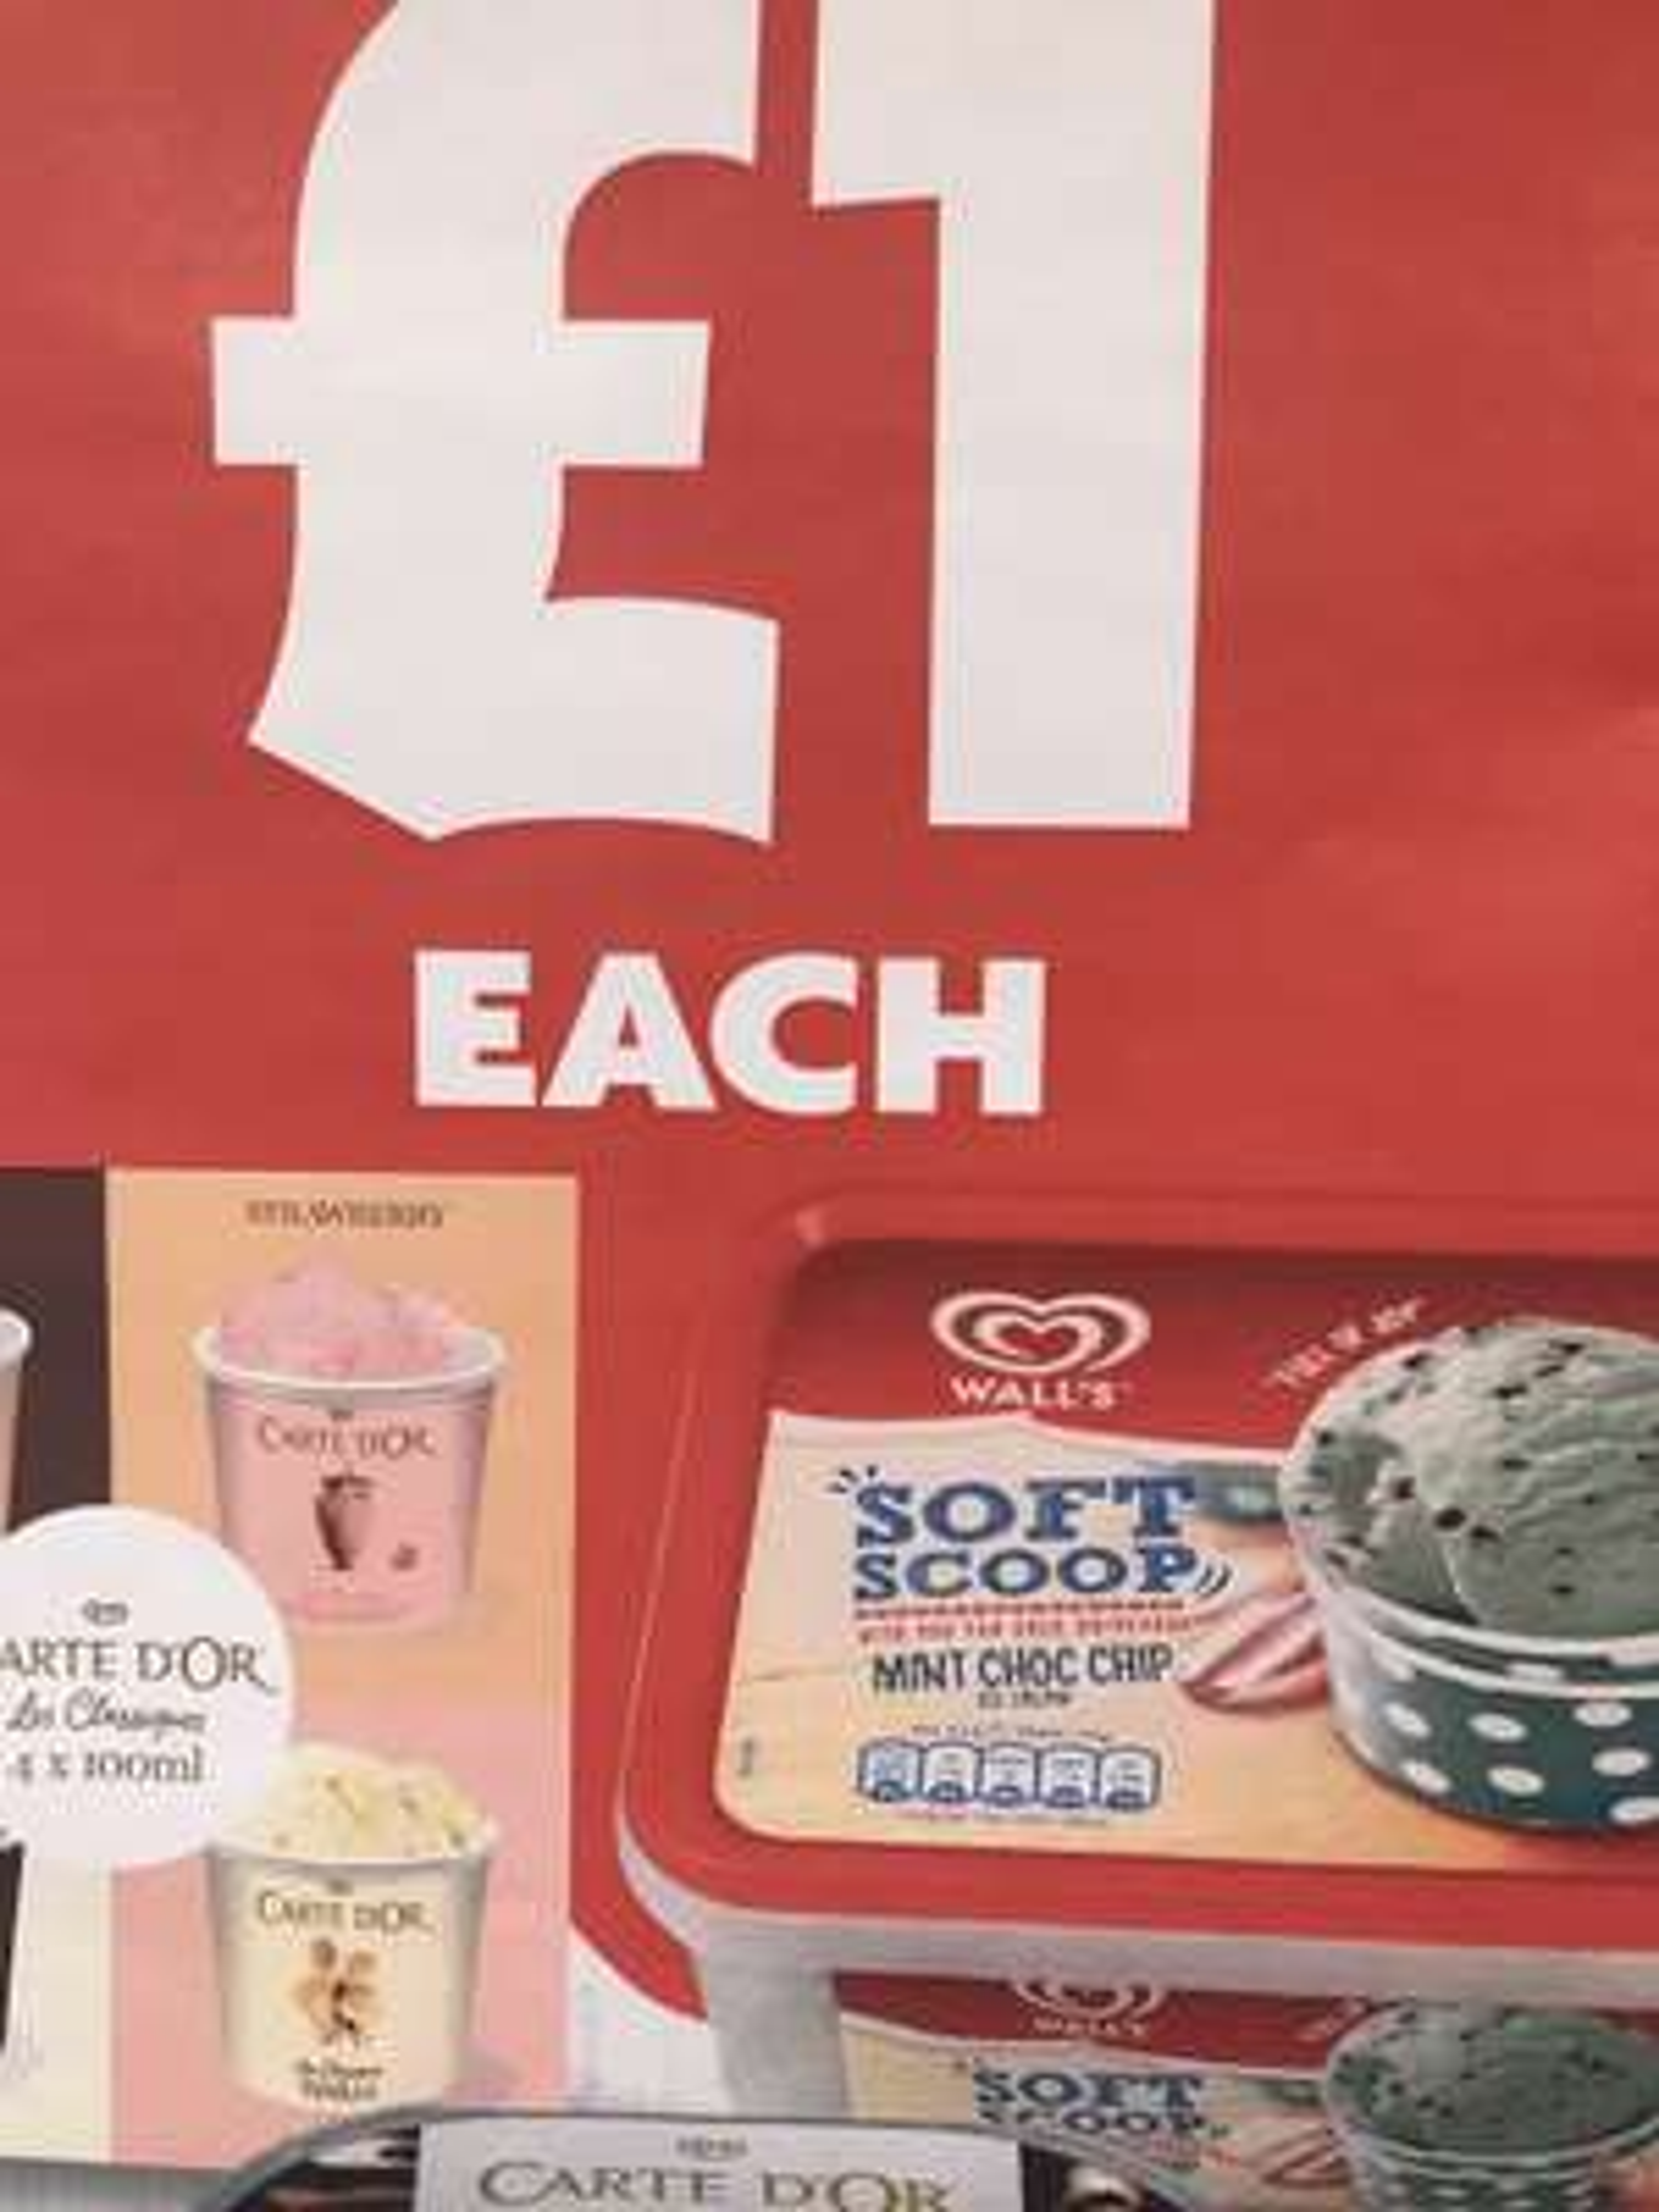 Walls mint choc chip soft scoop ice cream 1.8l - £1 Instore @ Iceland (Partington)